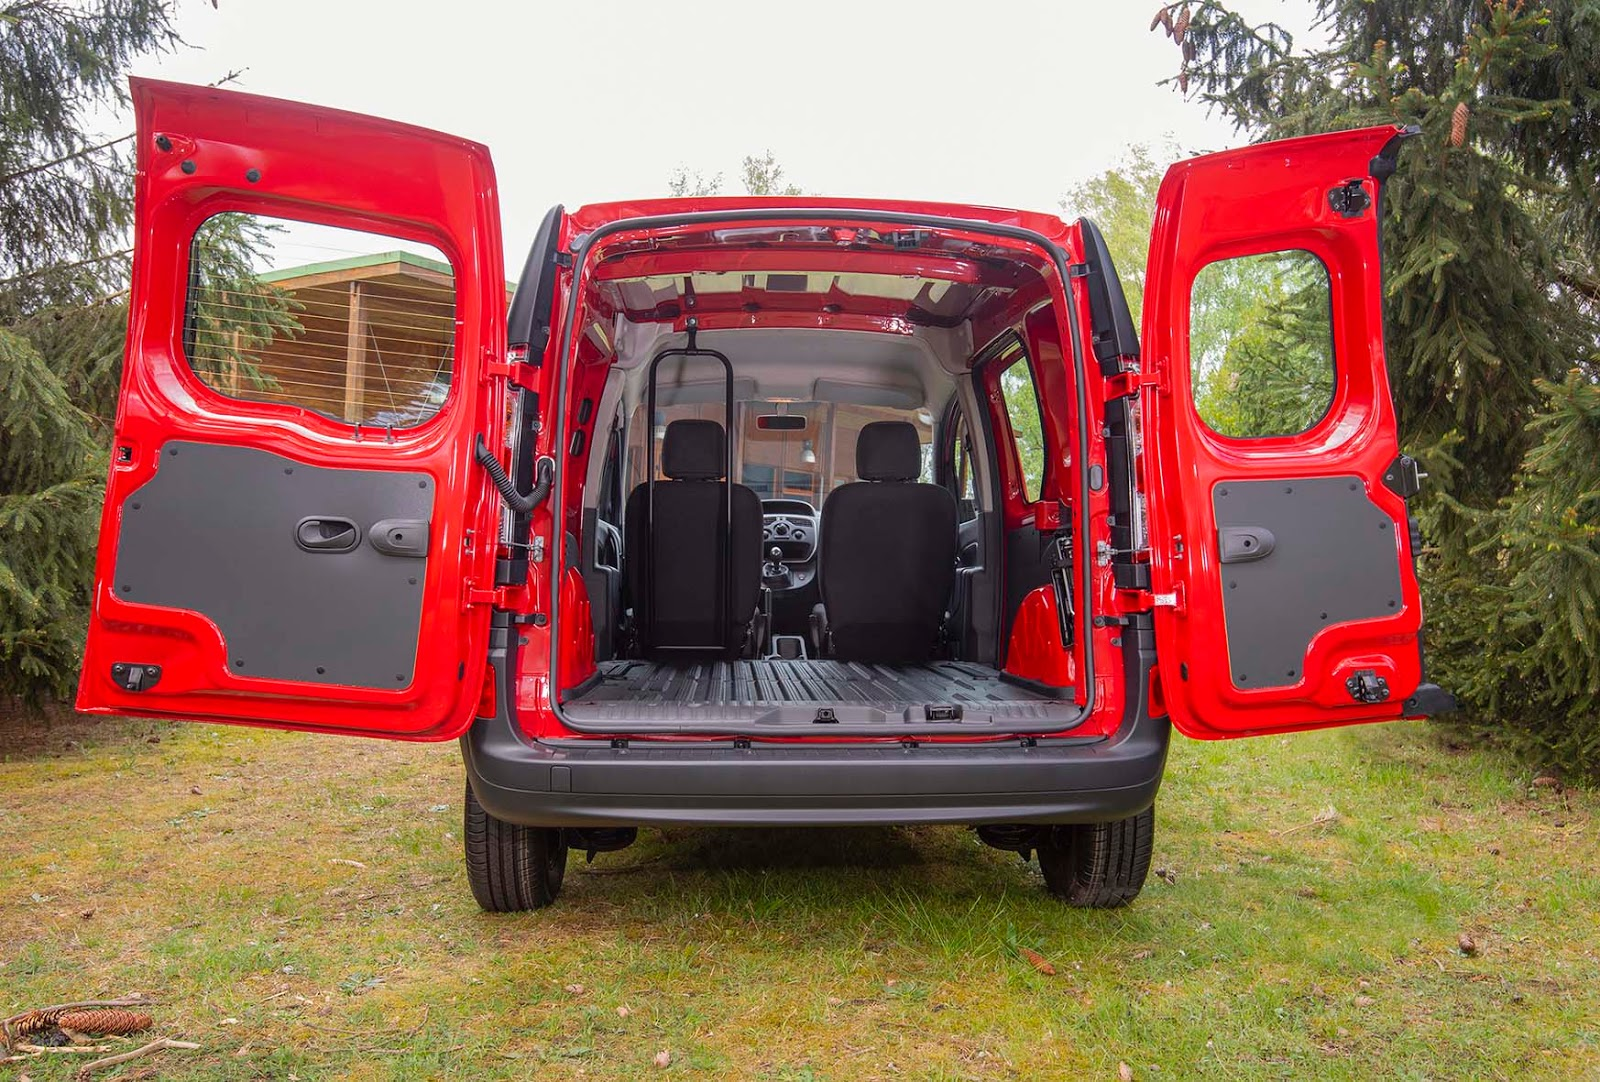 Nissan2BNV2502BL12BVan2B 2BRed2B 2BInterior2B7 Τον Σεπτέμβριο έρχεται το νέο Nissan NV250 Επαγγελματικά, καινούργιο, καινούρια, τιμες